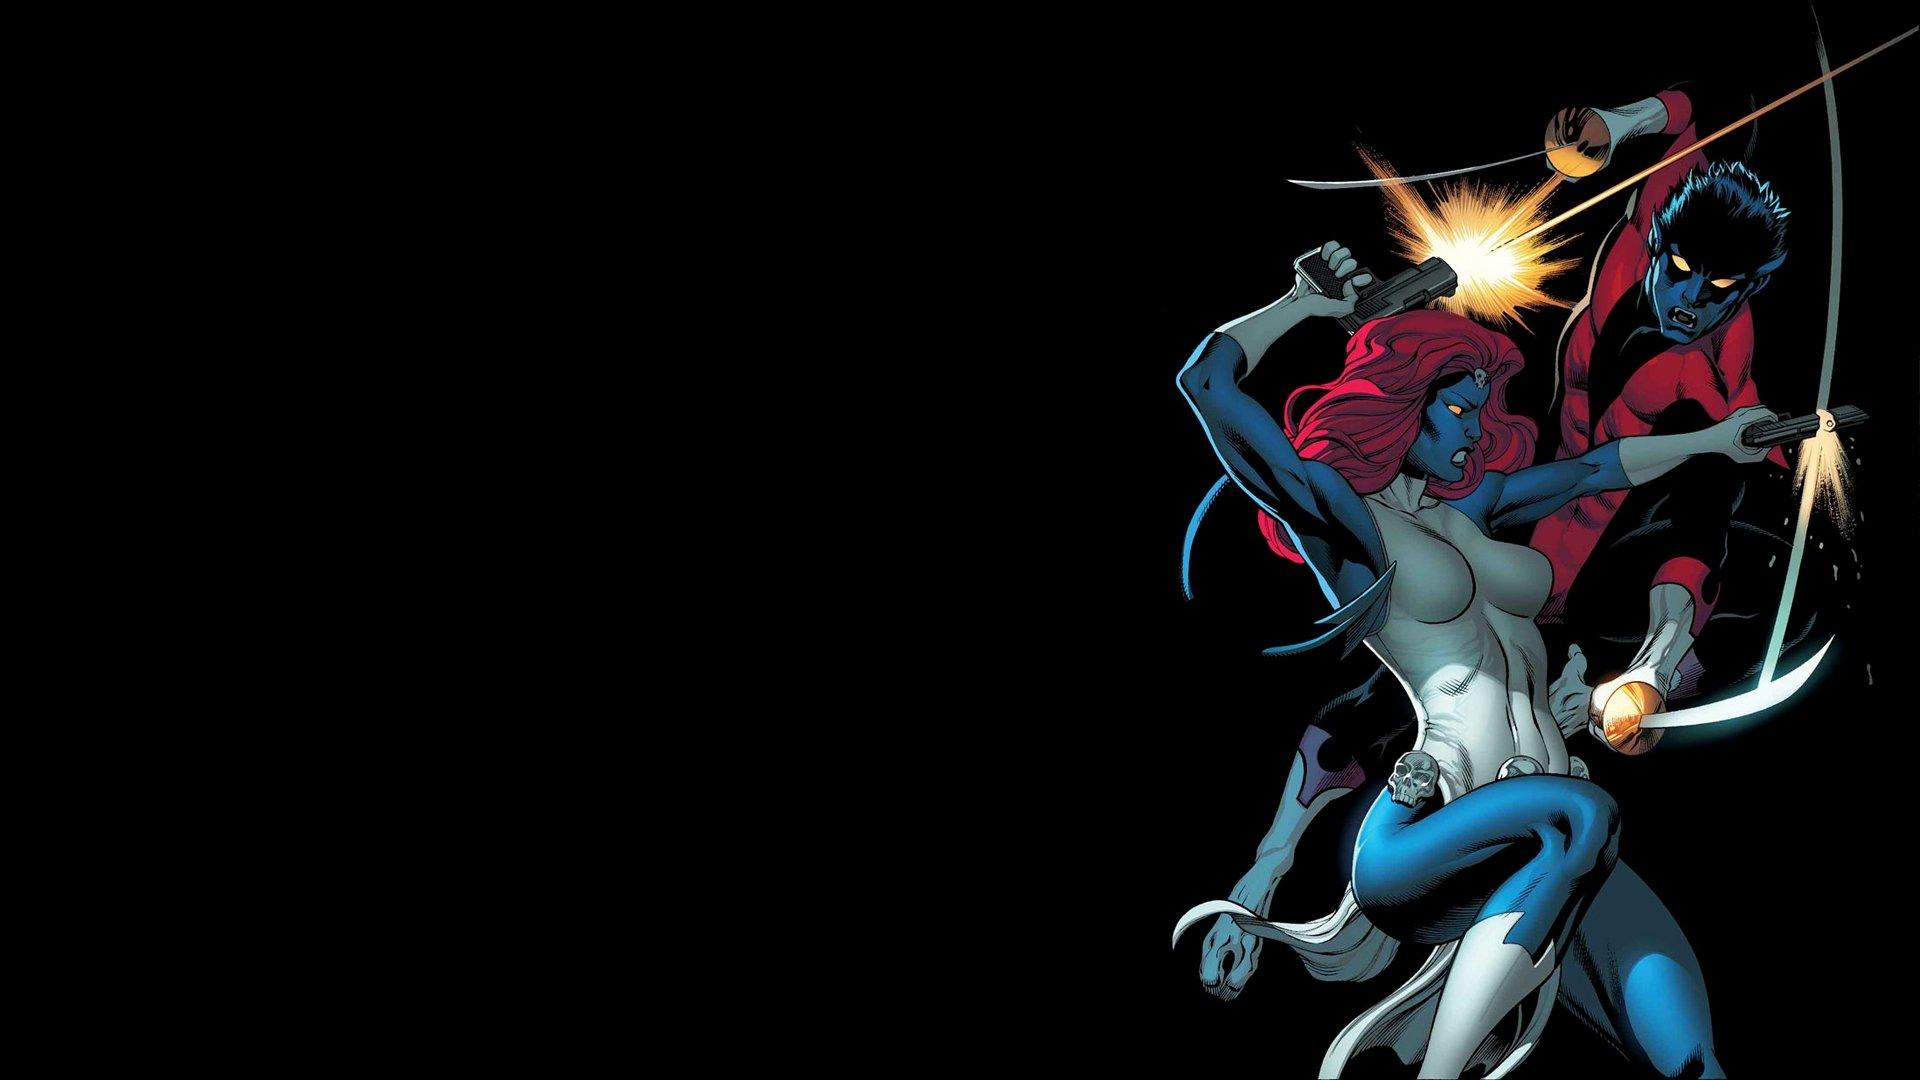 MYSTIQUE Marvel Superhero Action Xmen X Men Sexy Babe